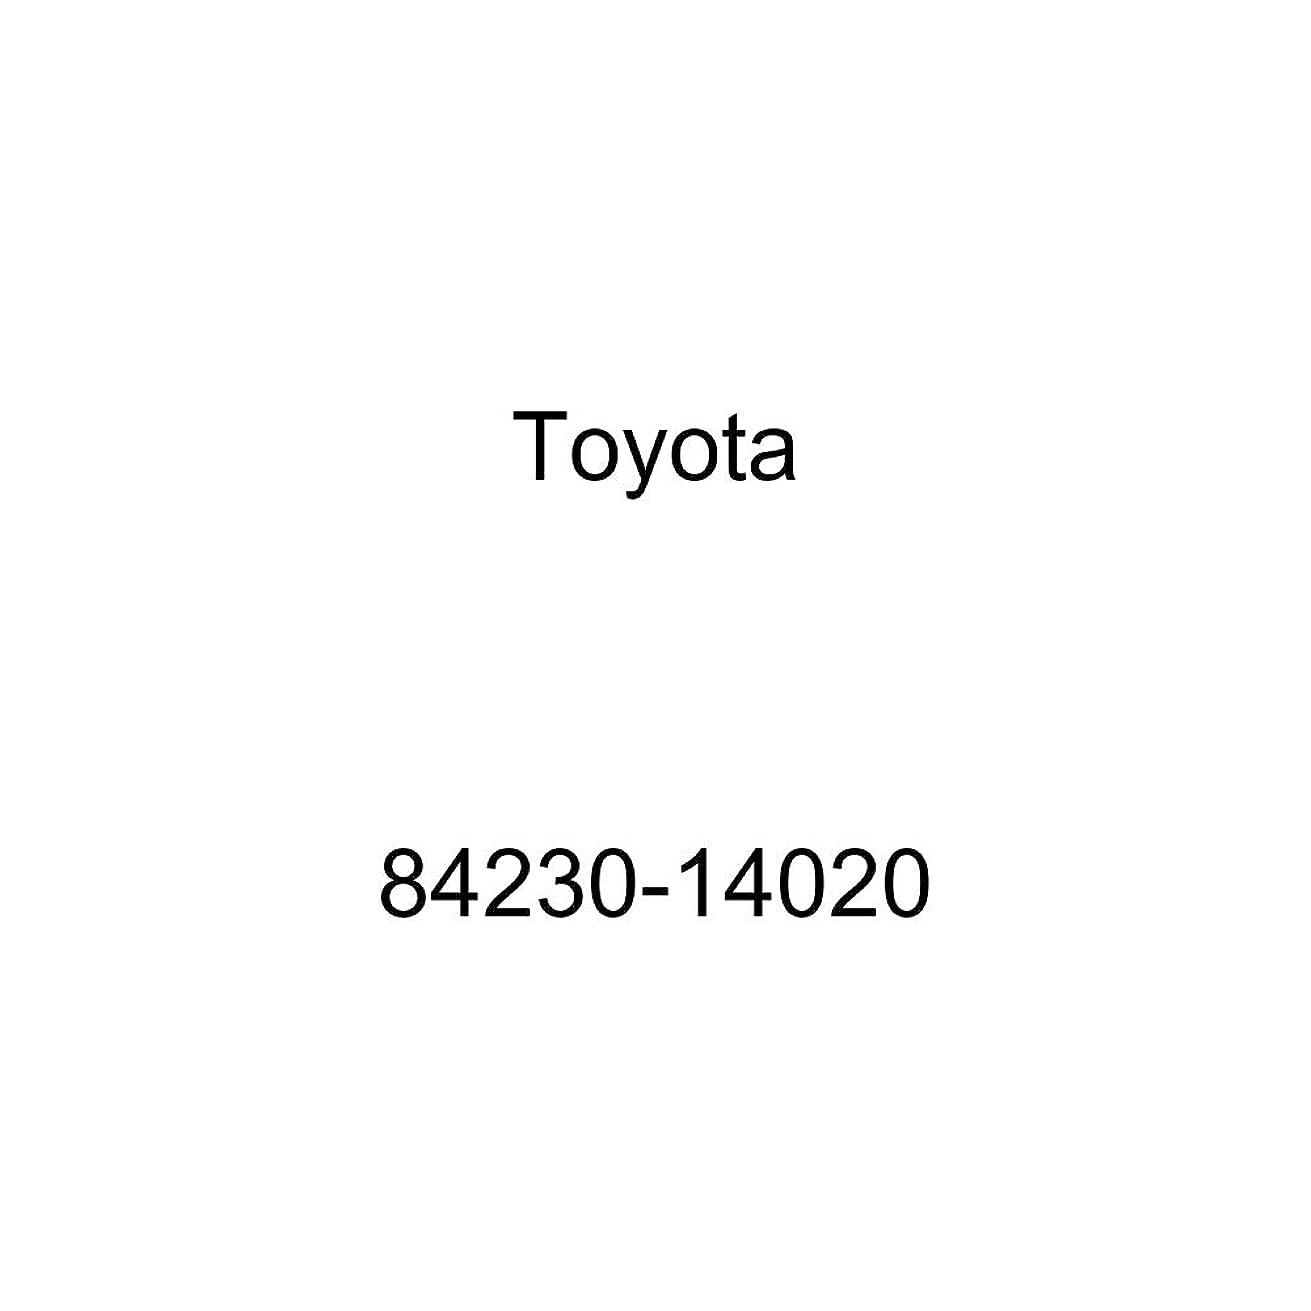 Toyota 84230-14020 Courtesy Lamp Switch Assembly